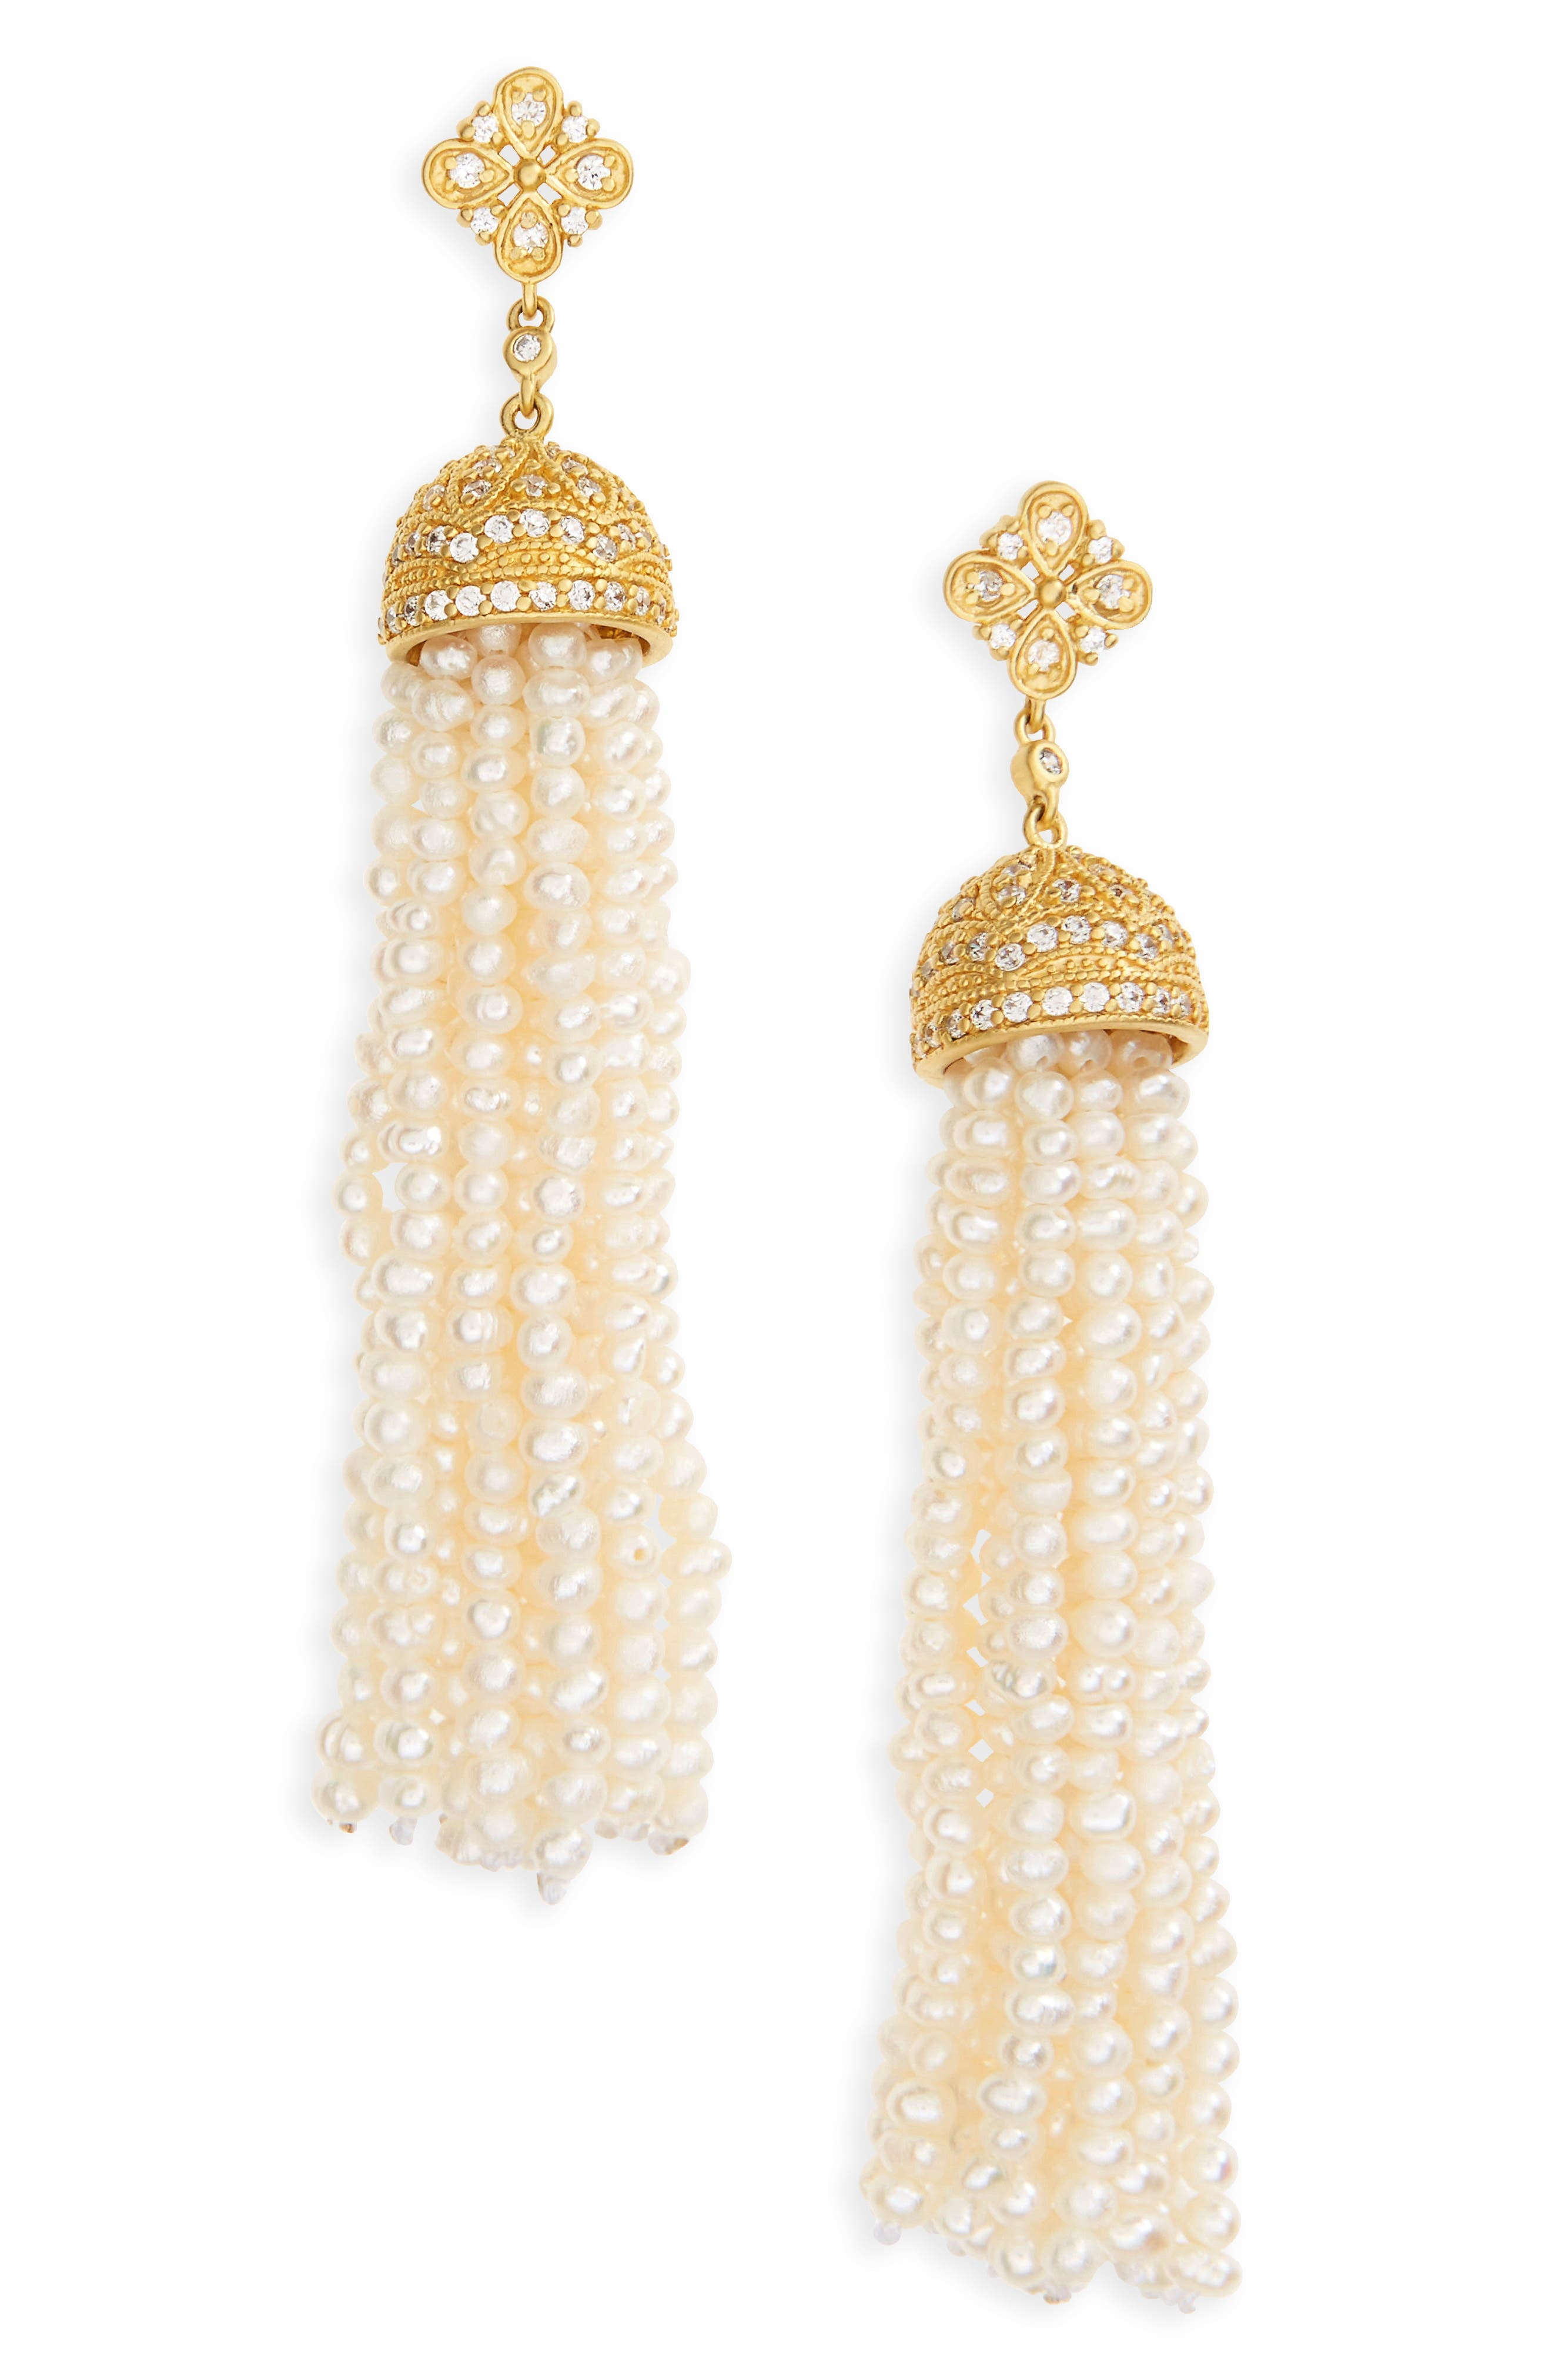 FREIDA ROTHMAN Audrey Waterfall Tassel Pearl Earrings